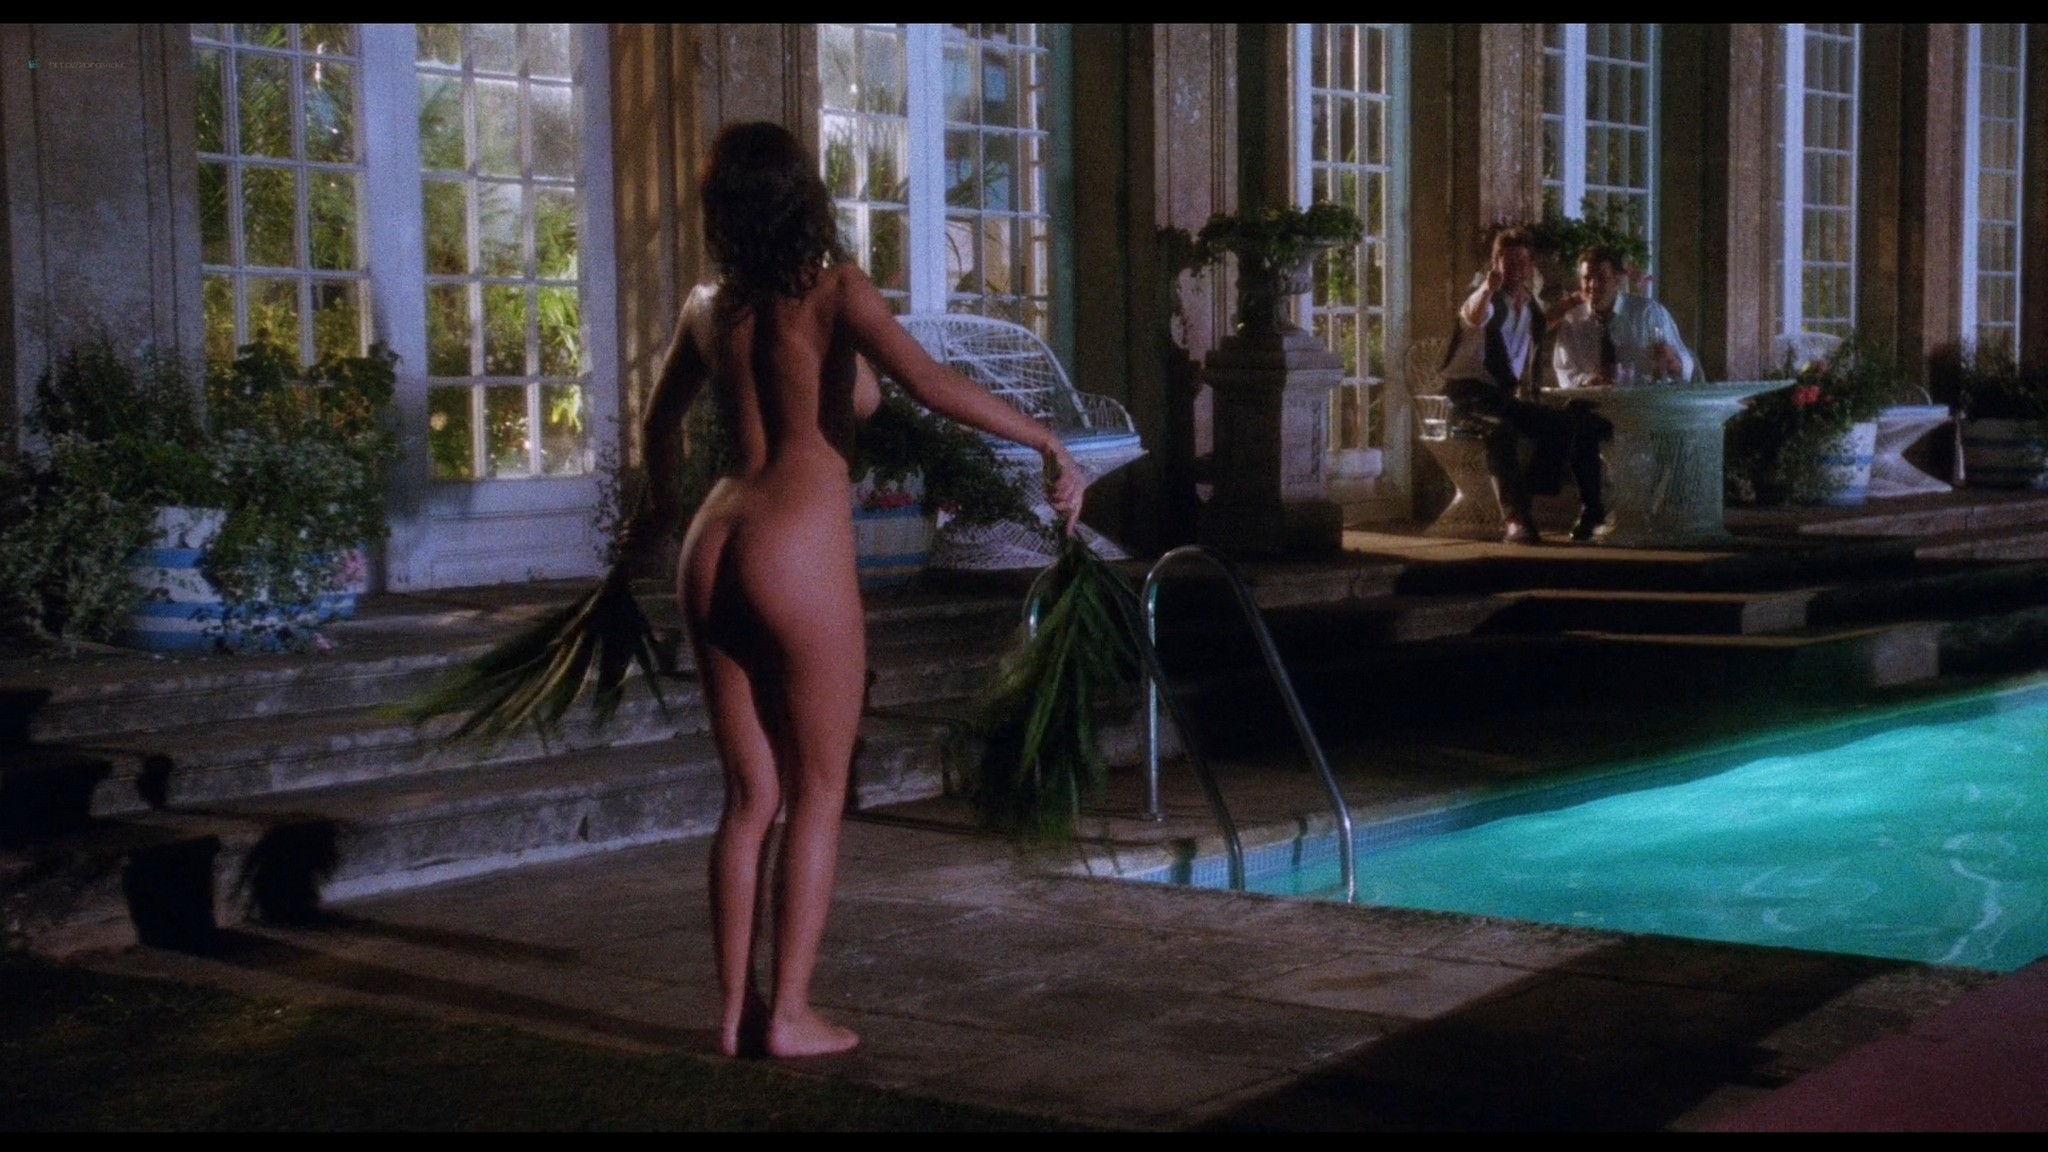 Bridget Fonda nude butt boobs Britt Ekland nude Joanne Whalley hot - Scandal (1989) HD 1080p BluRay (7)